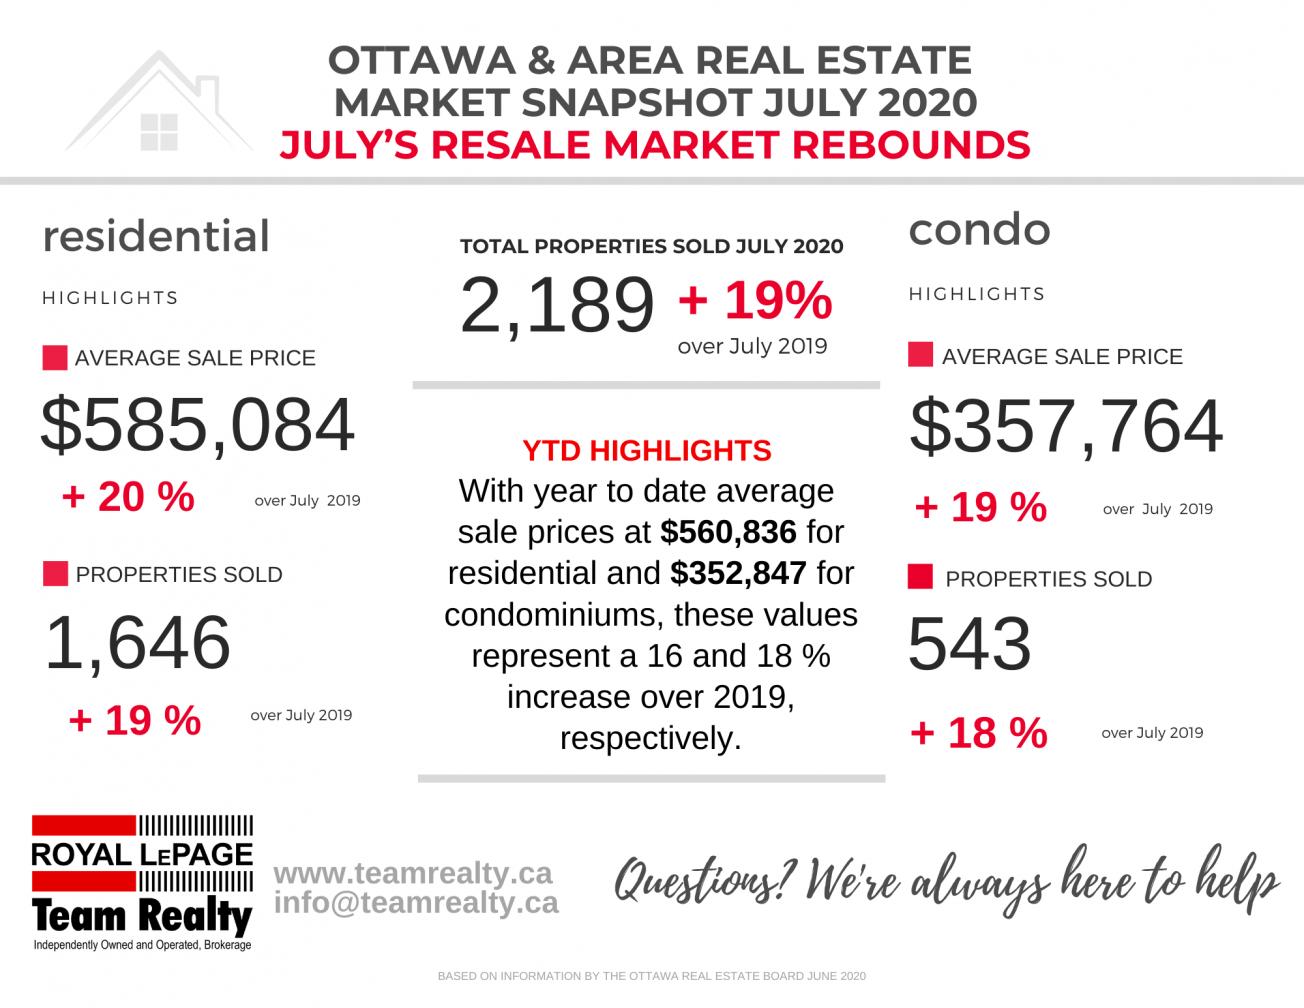 Ottawa and Area Real Estate Market Snapshot July 2020 2